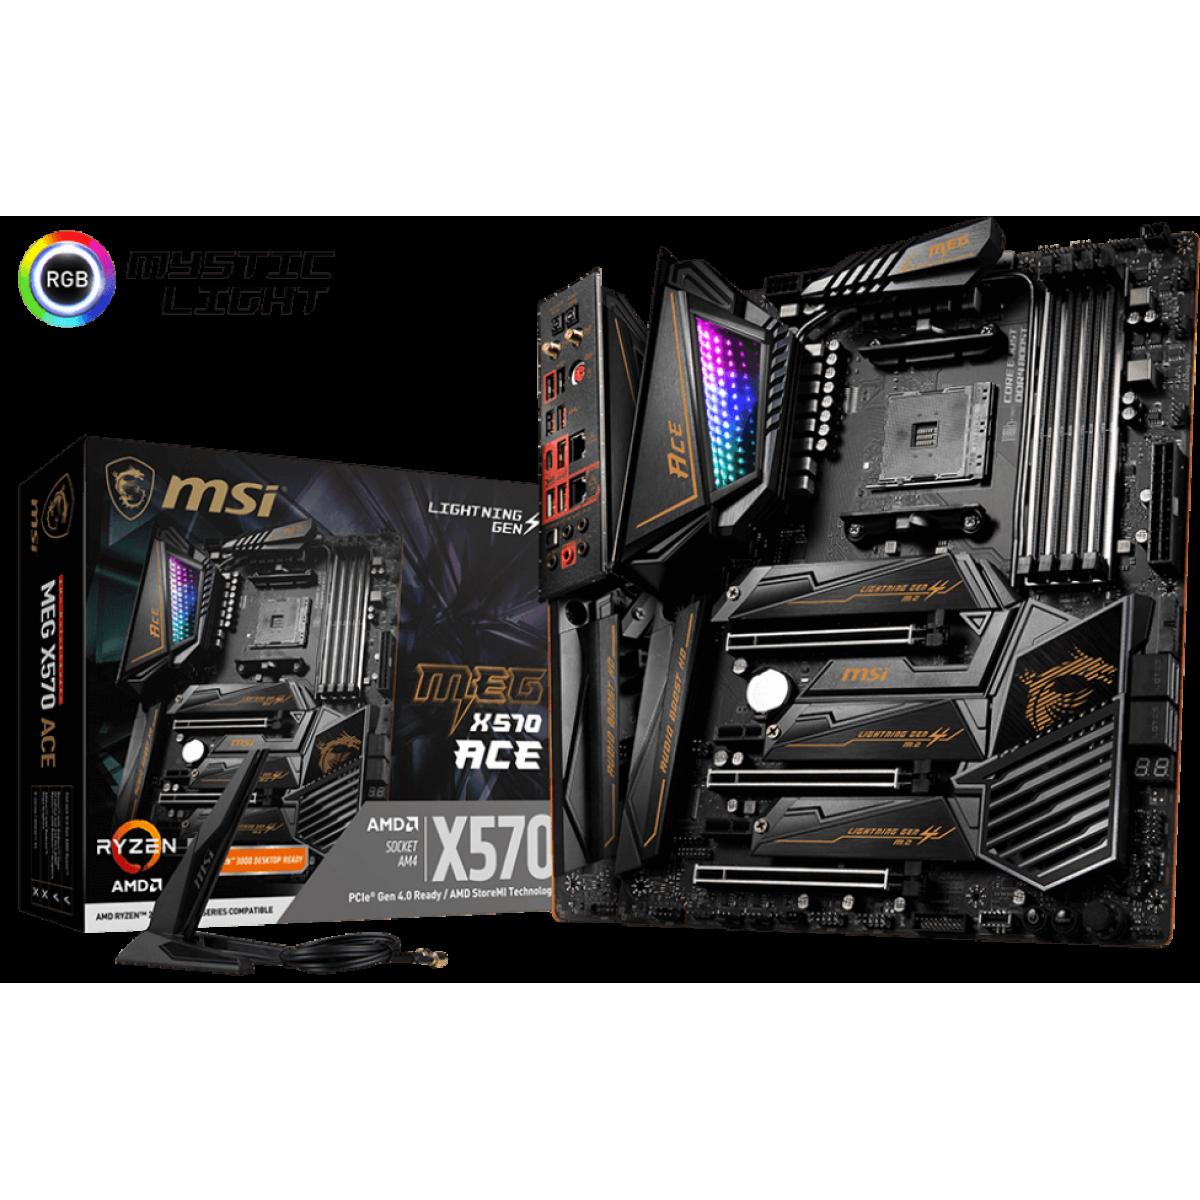 Placa Mãe MSI MEG X570 ACE, Chipset X570, AMD AM4, ATX, DDR4